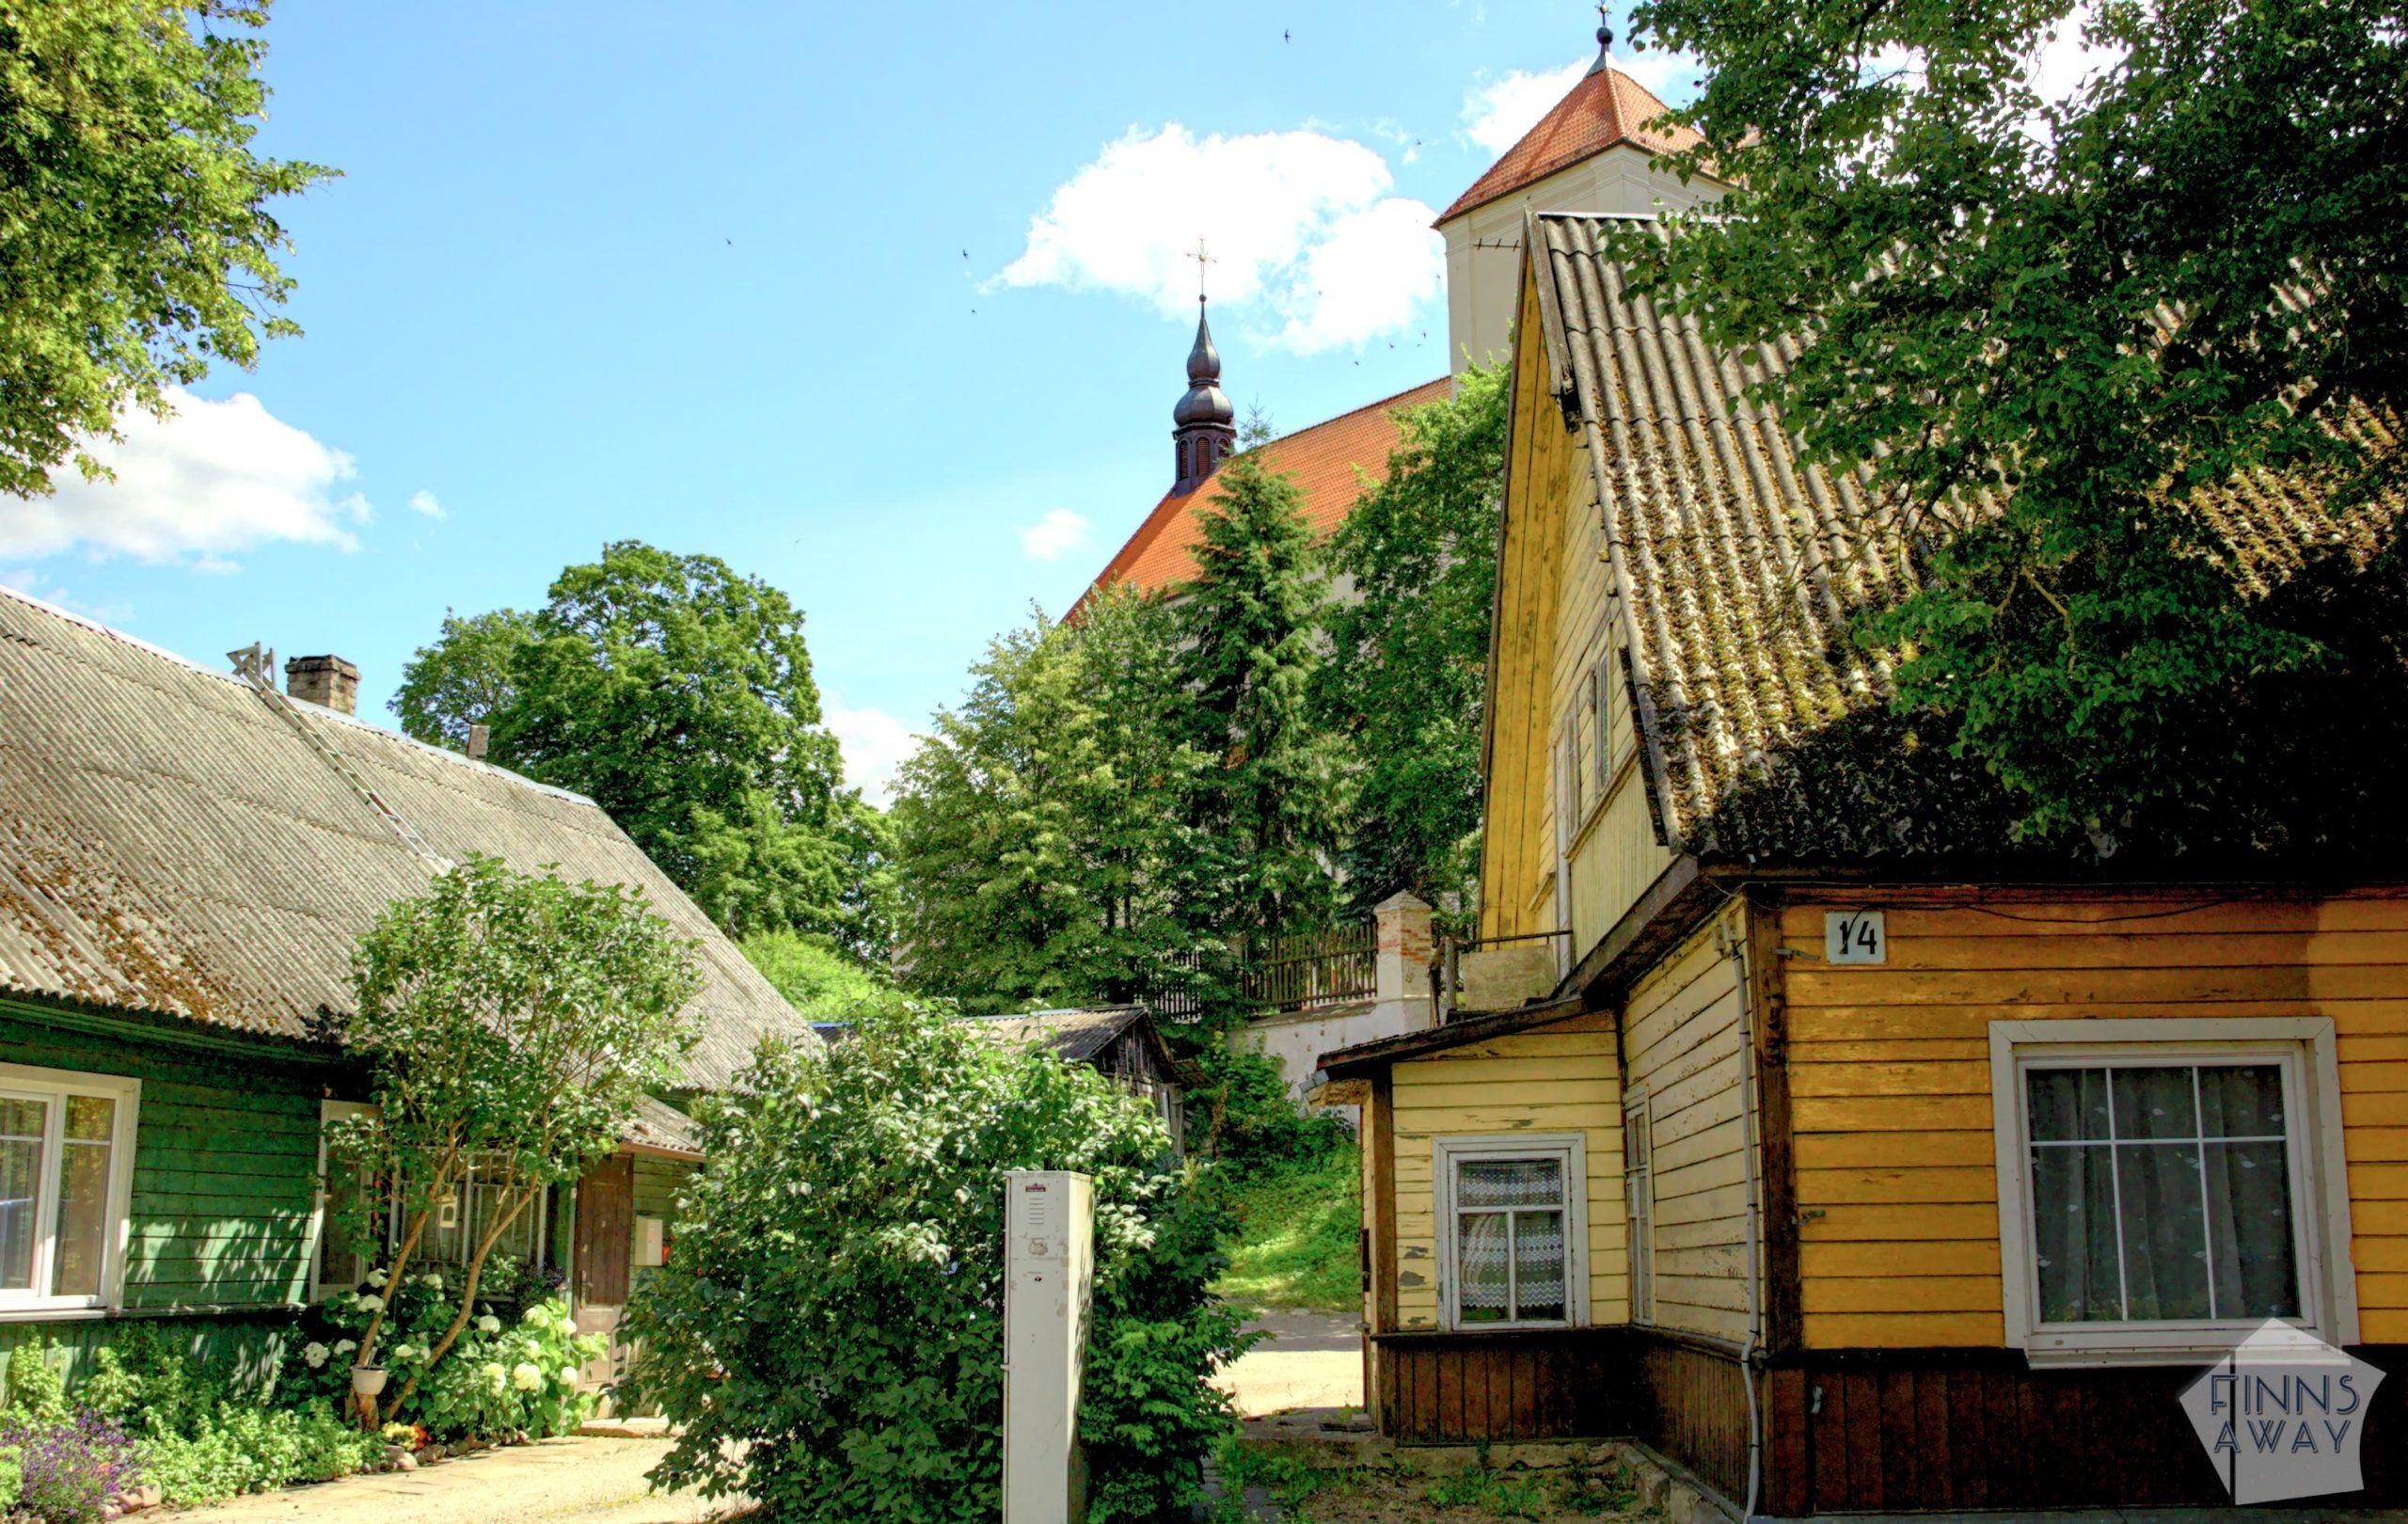 Streetview in beautiful Trakai | Trakai in Lithuania – castles, Karaim culture and nature | FinnsAway Travel Blog